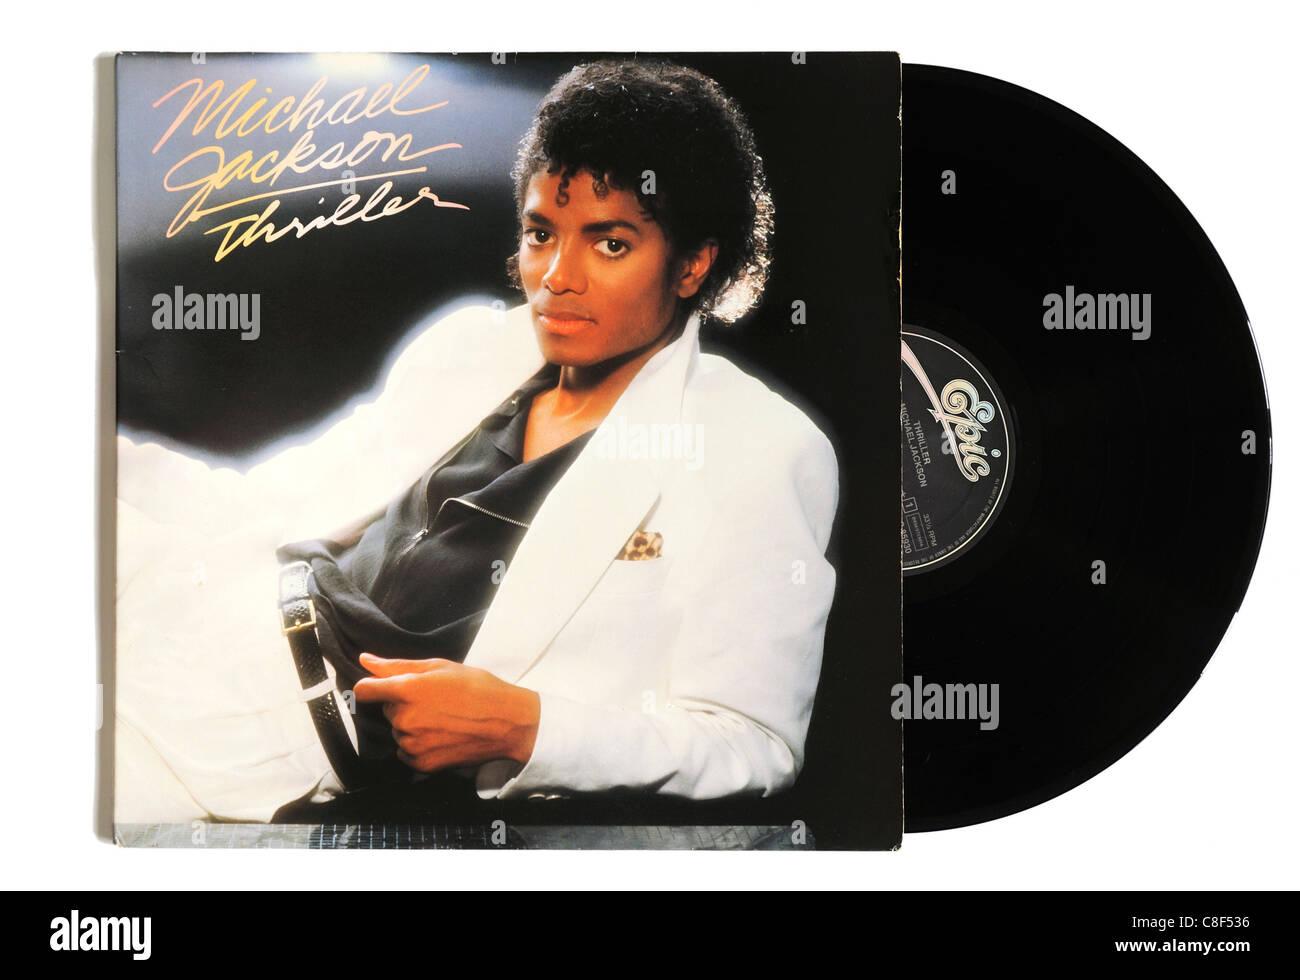 Michael Jackson Thriller álbum Imagen De Stock